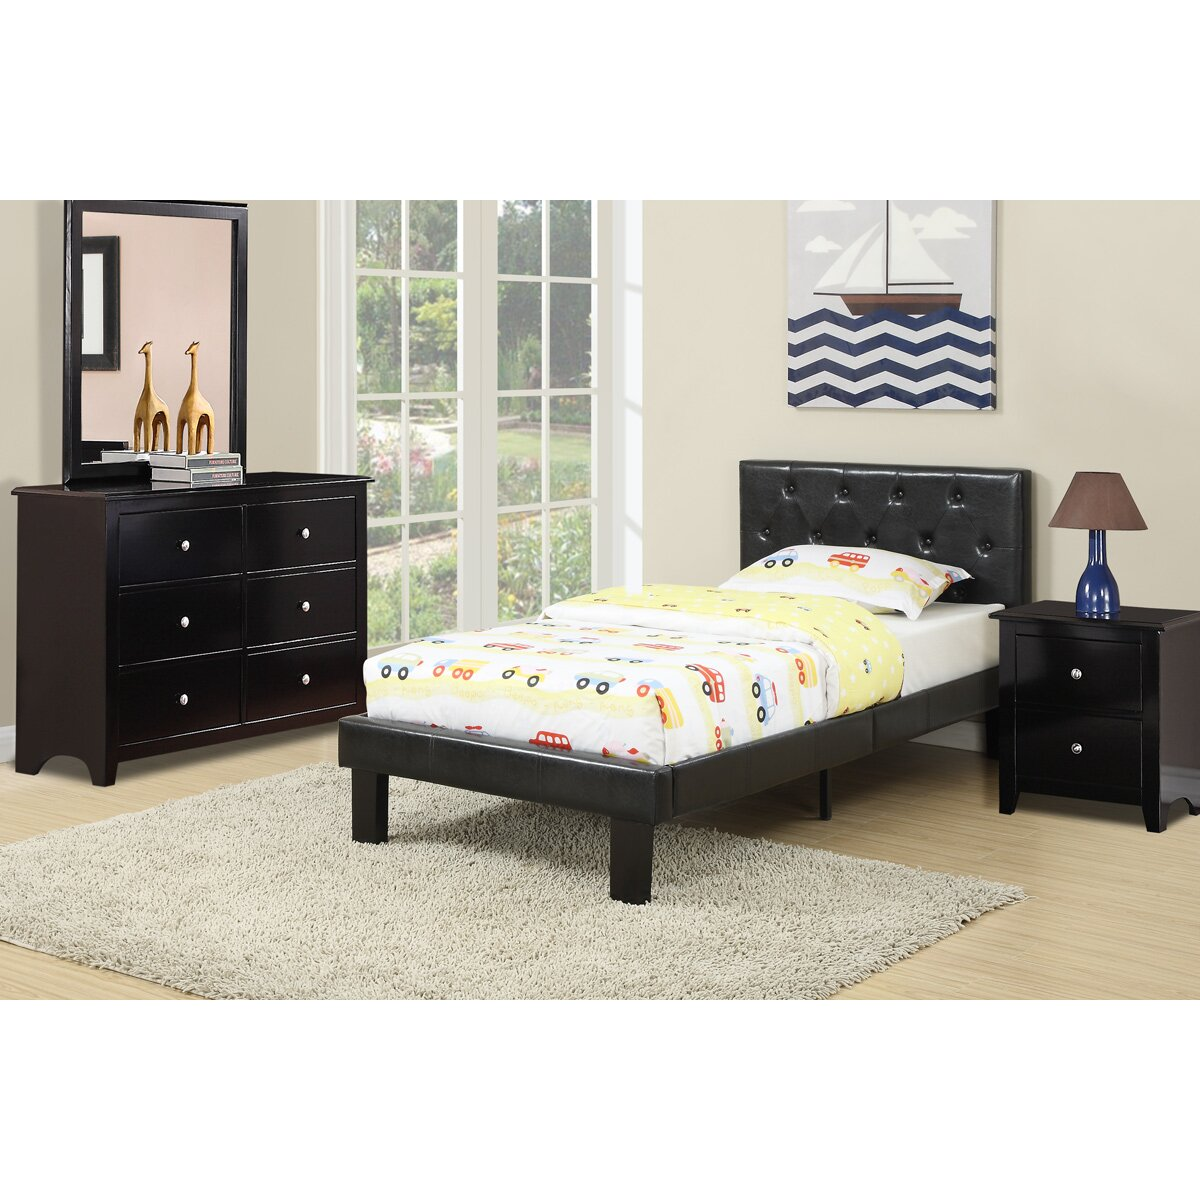 Poundex Twin Platform Bed